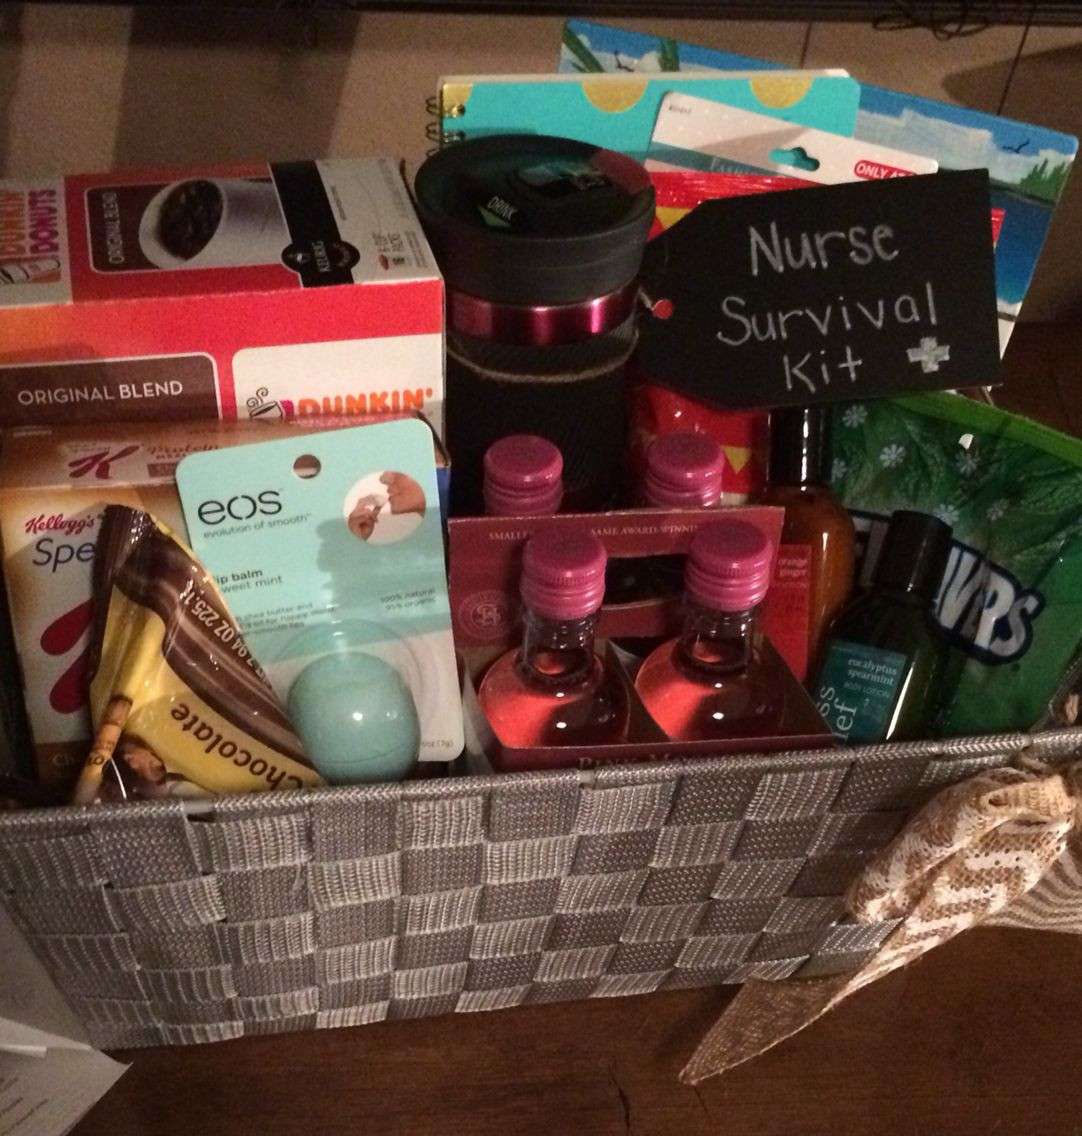 College Graduation Gift Ideas For Nurses  Nurse survival kit Graduation t